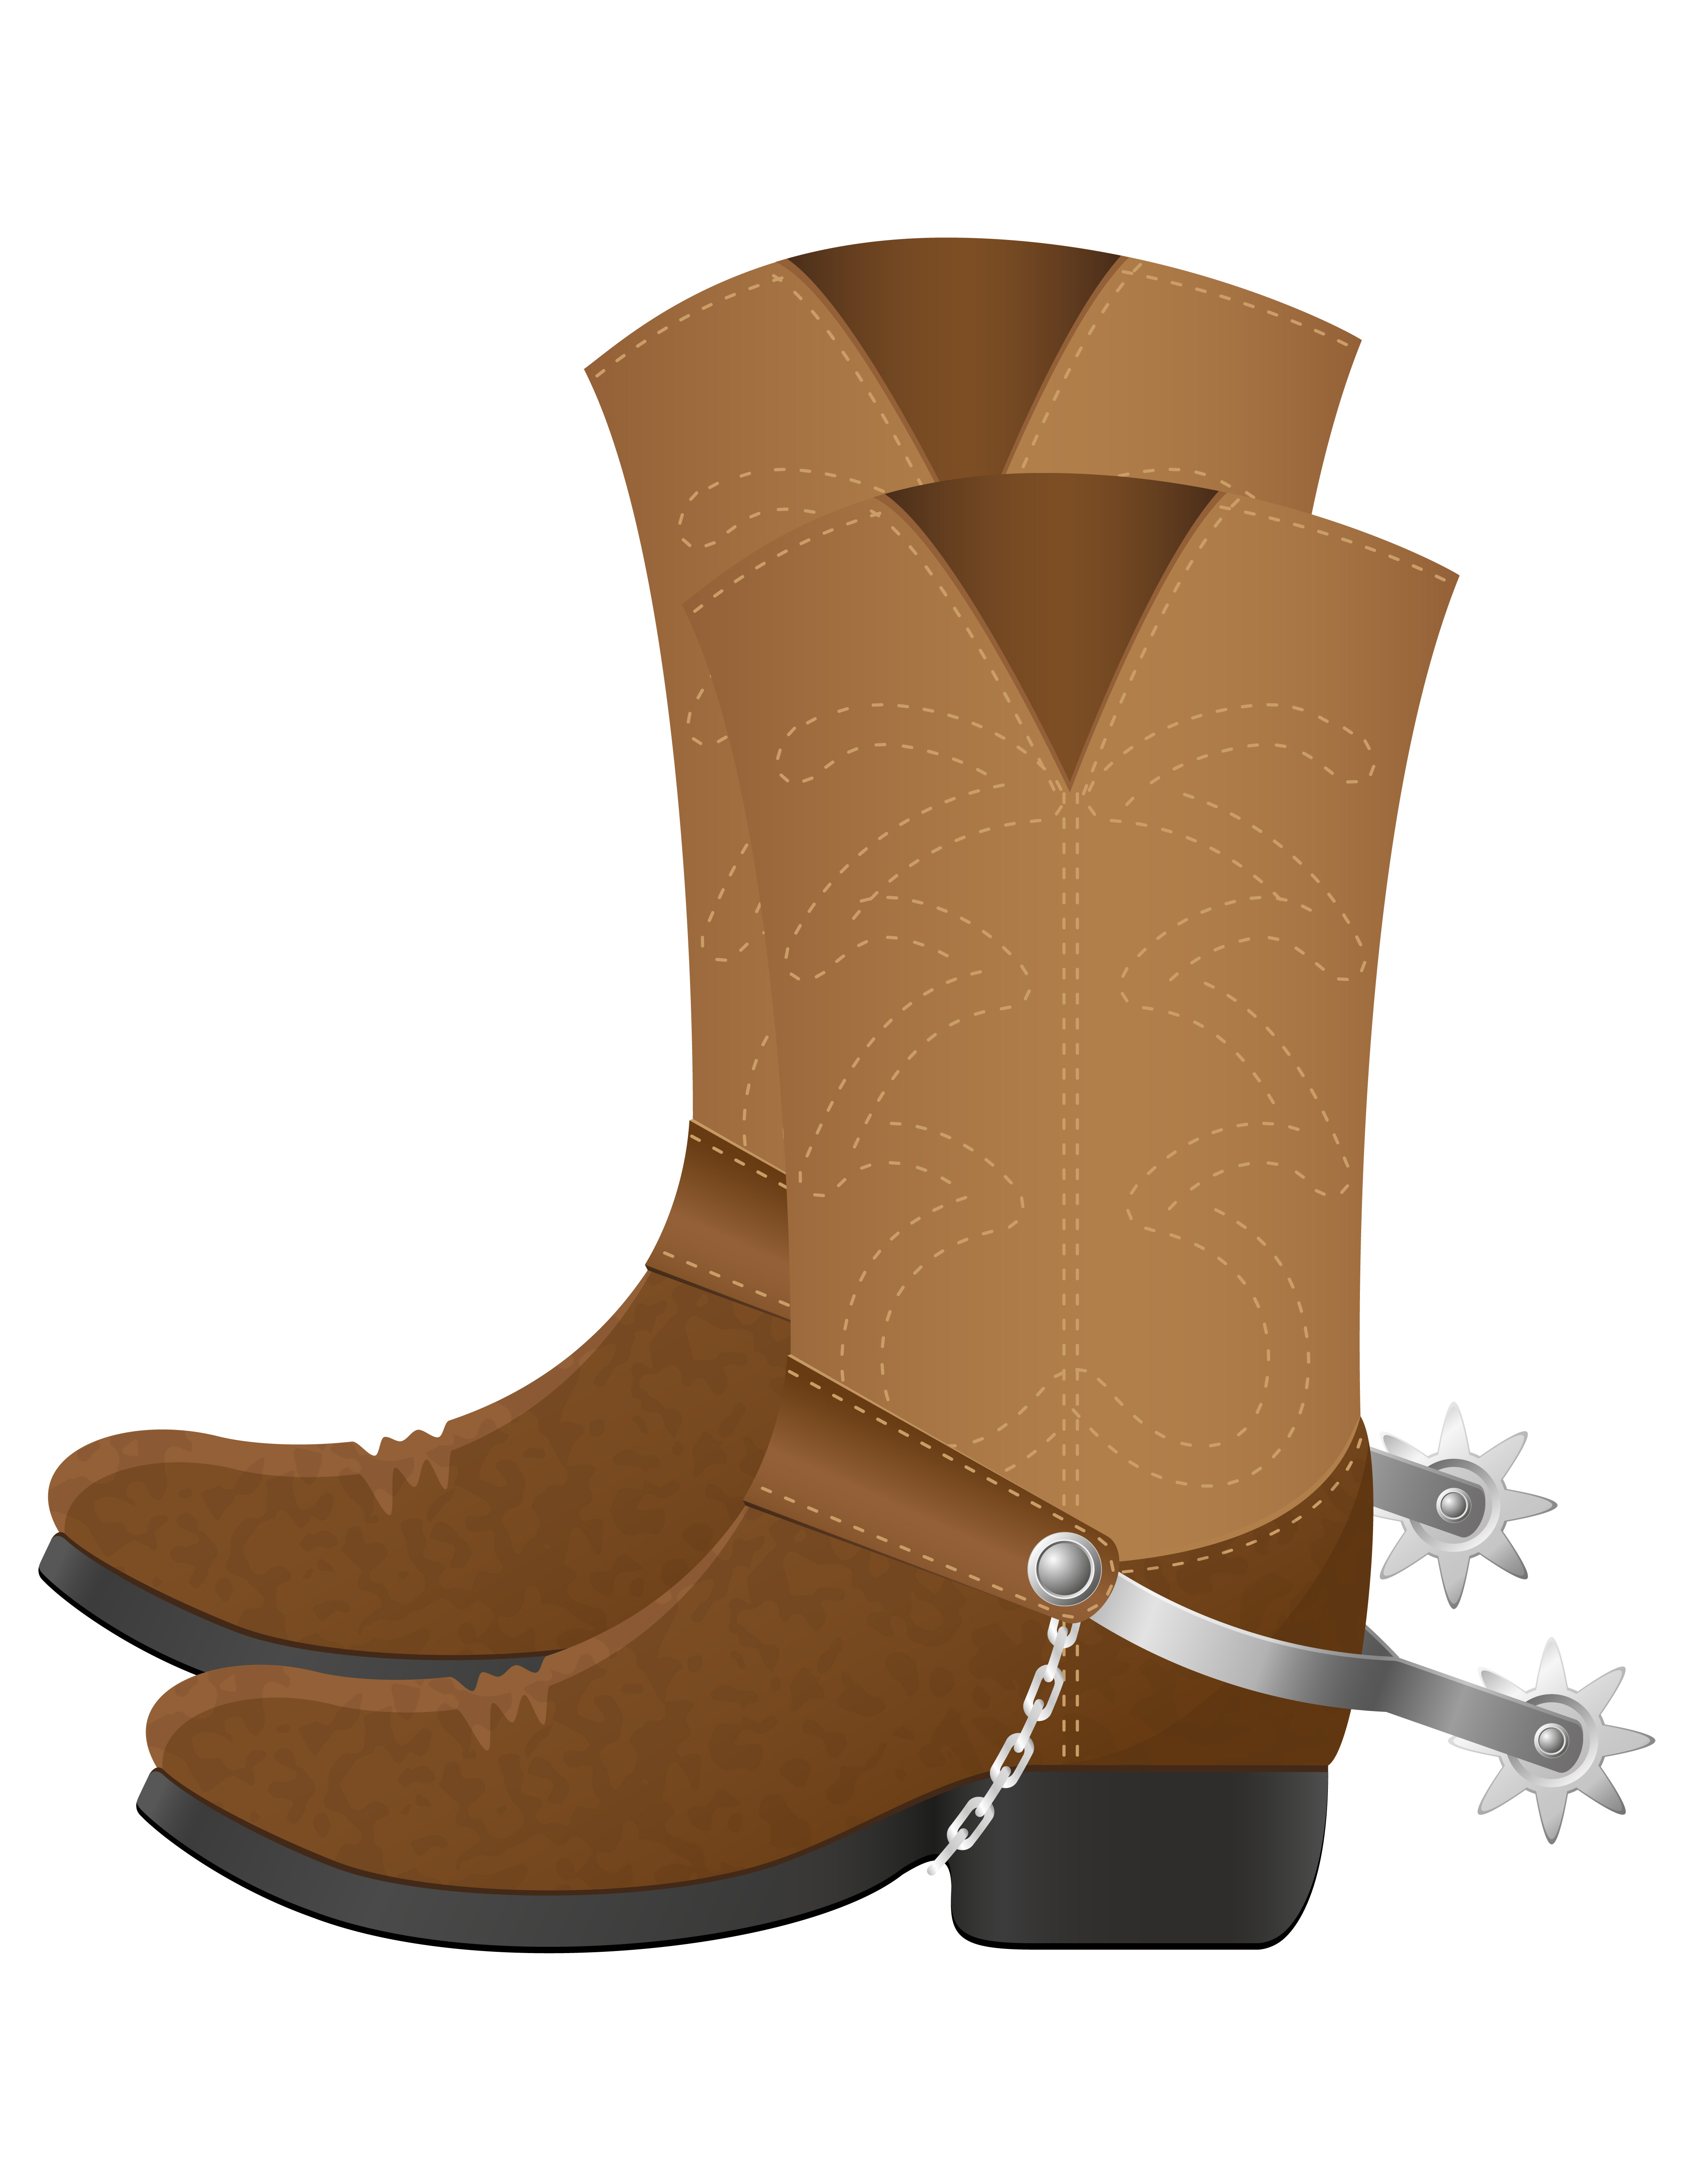 cowboy boots vector illustration - Download Free Vectors ... - photo#25